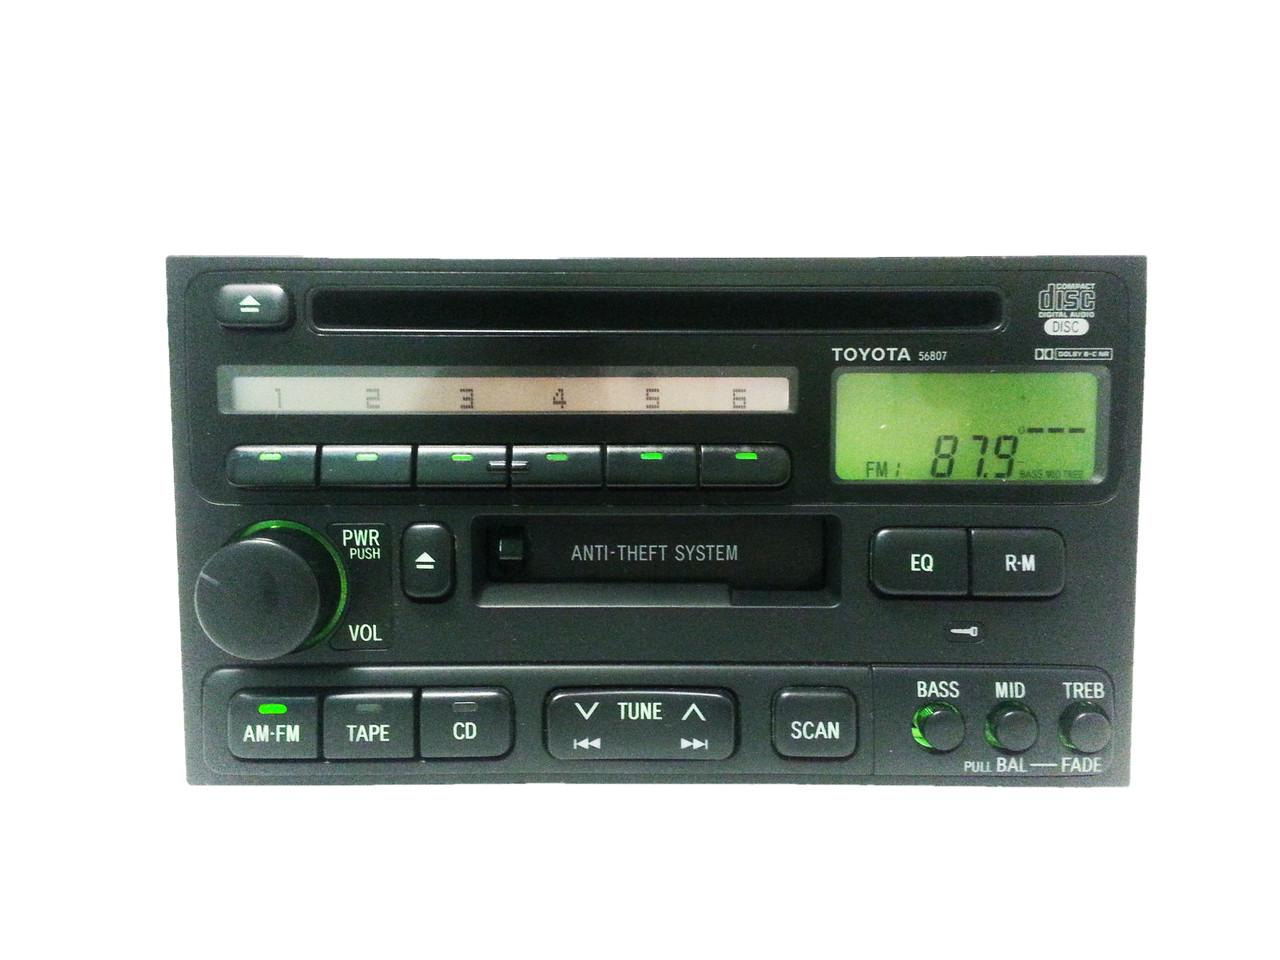 hight resolution of toyota factory oem radio tape and cd player 4runner avalon camry celica land cruiser solara sienna 56807 86120 33040 1990 1991 1992 1993 1994 1995 1996